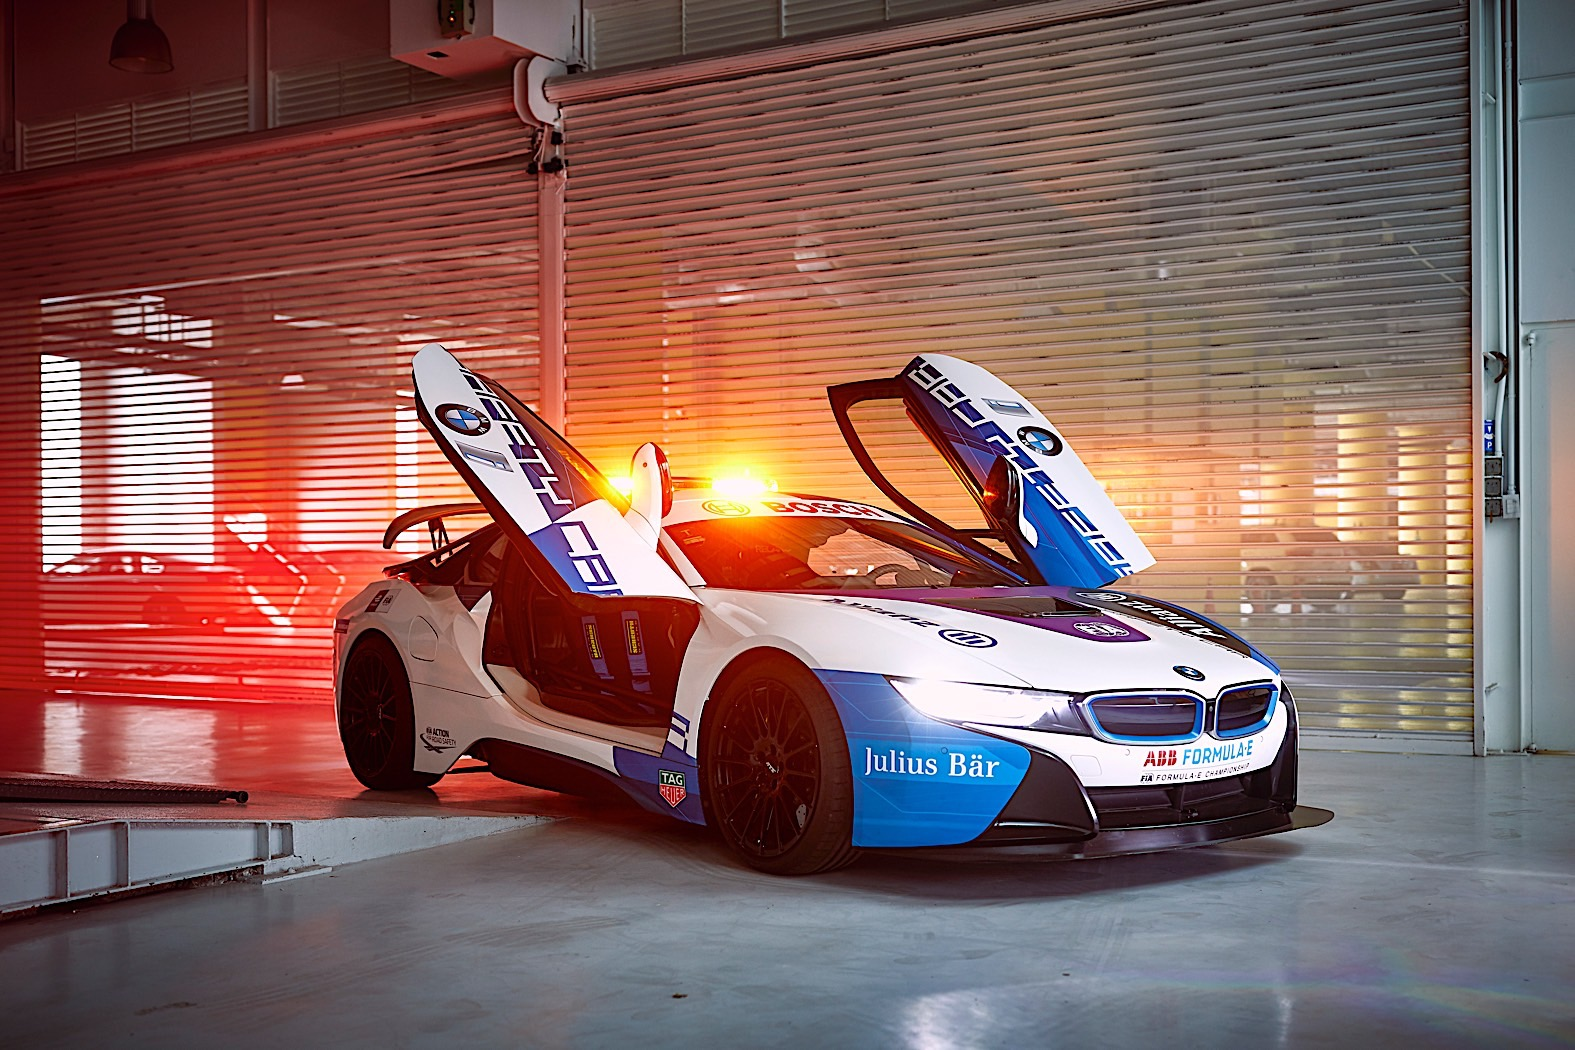 Bmw I8 Coupe Formula E Safety Car Gets New Livery For 2019 Season